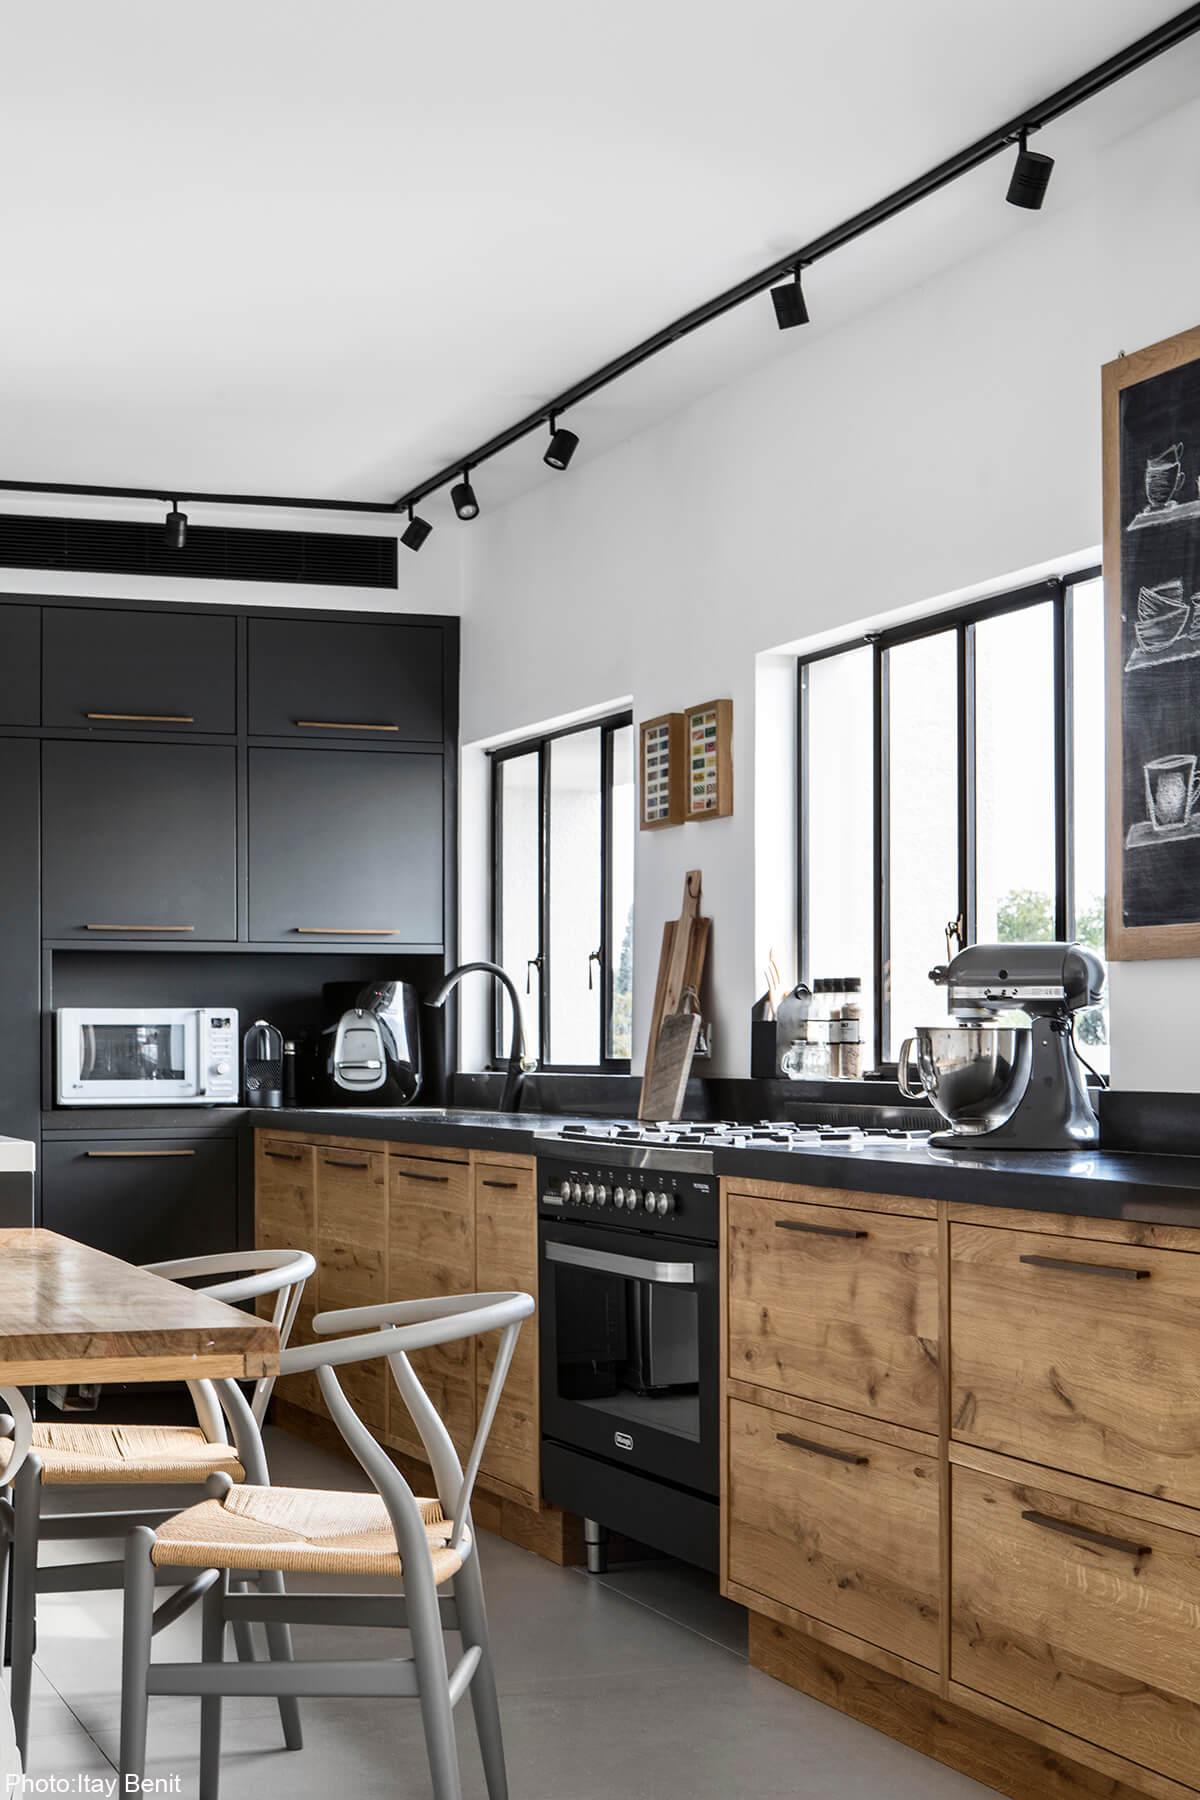 Wooden kitchen by Roni Bartal - Fineshmaker